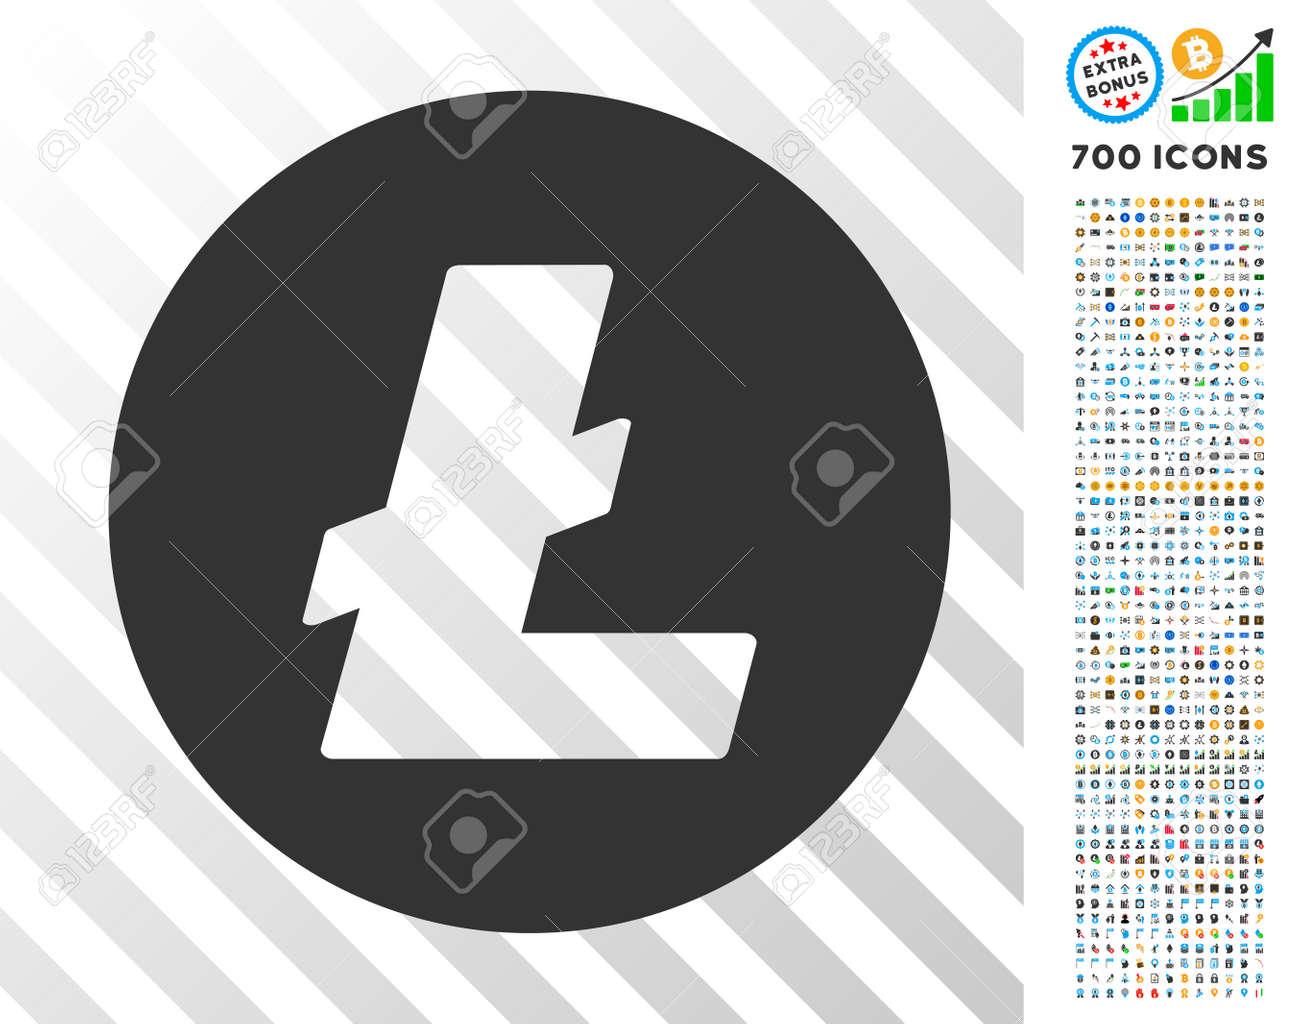 Litecoin Coin icon with 7 hundred bonus bitcoin mining and blockchain